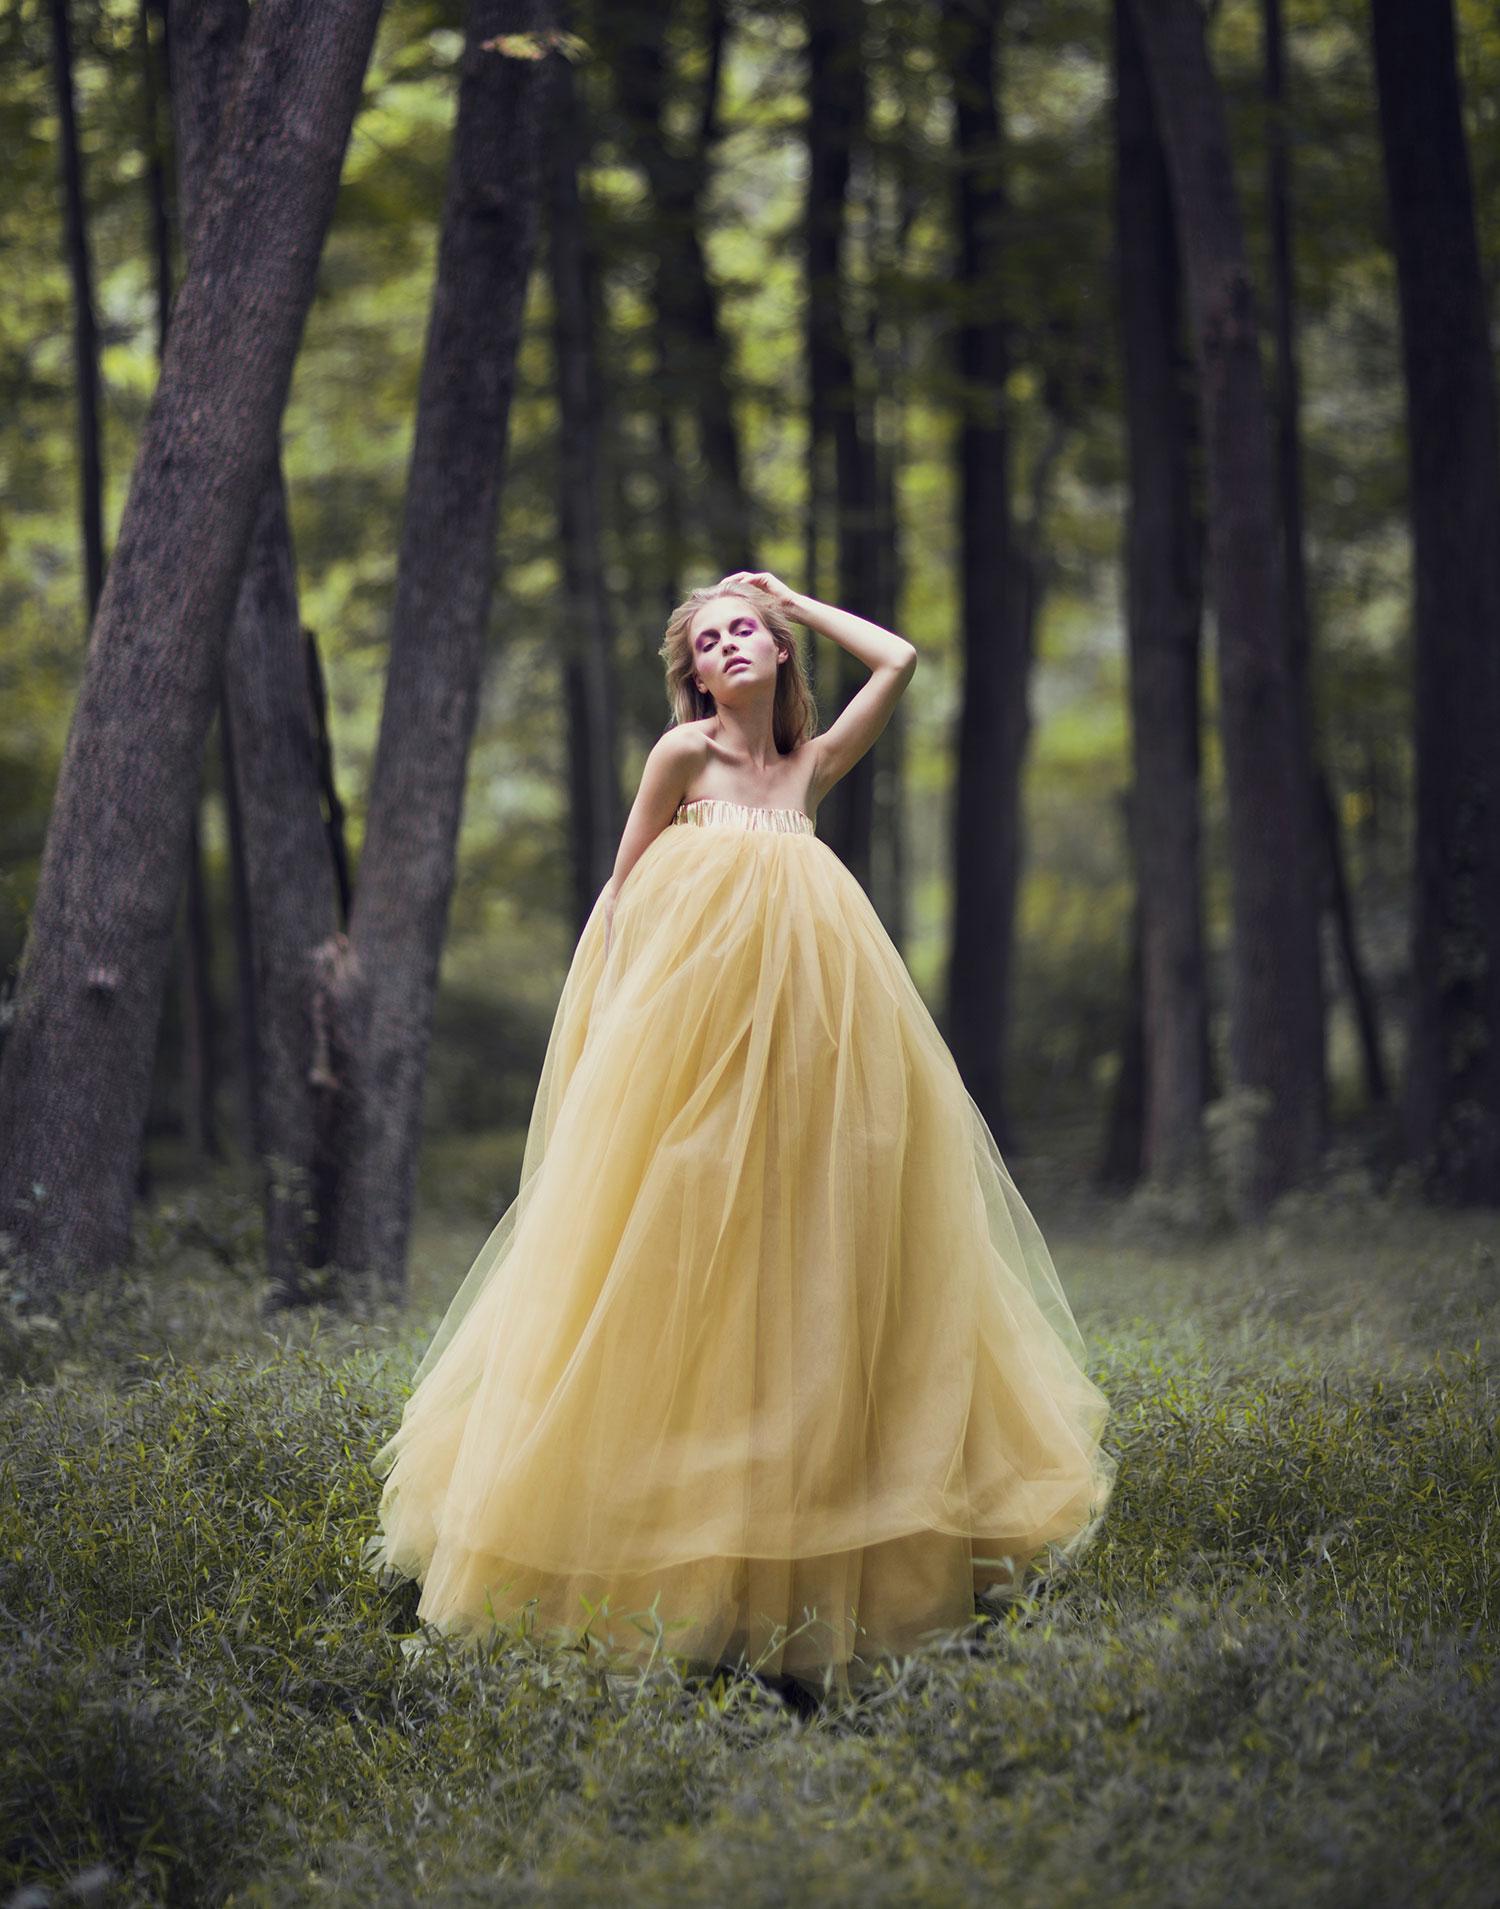 FashionPhotographer_FashionEditorial_By_BriJohnson_0052.jpg